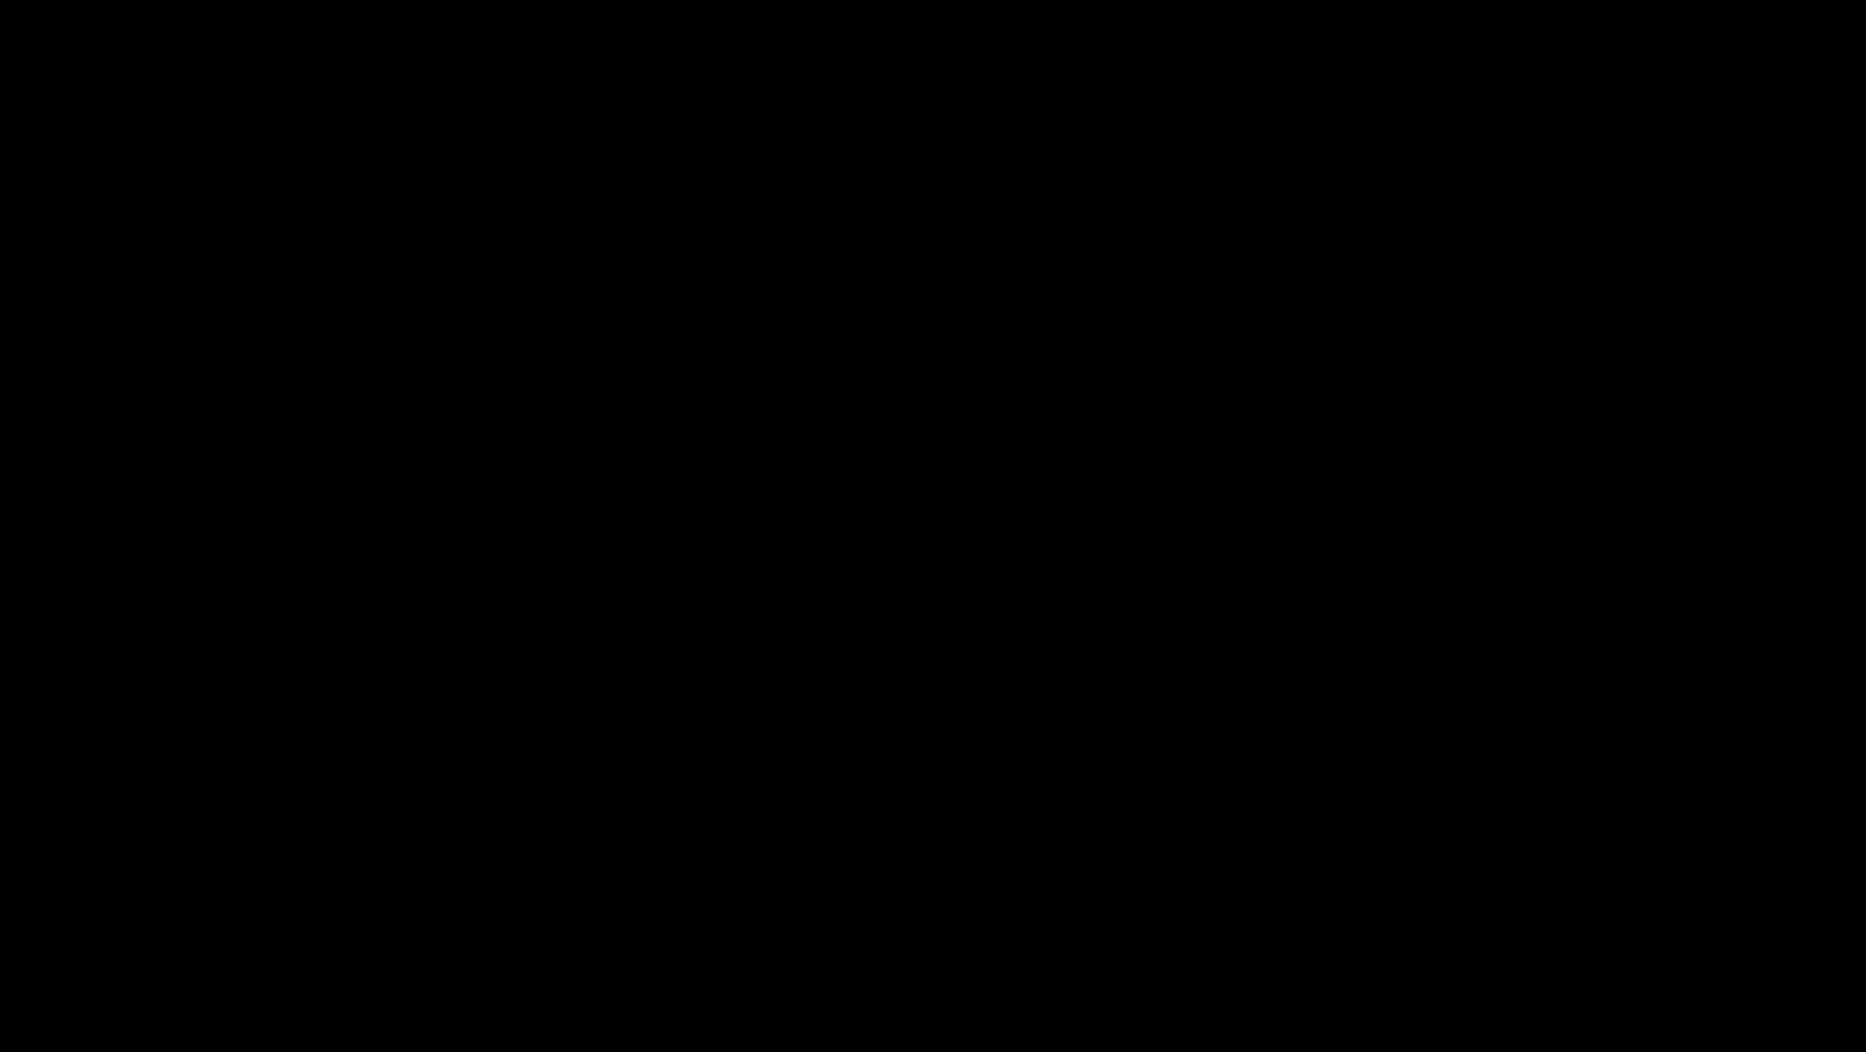 png black and white download Bardock SSJ by Comebackv on DeviantArt